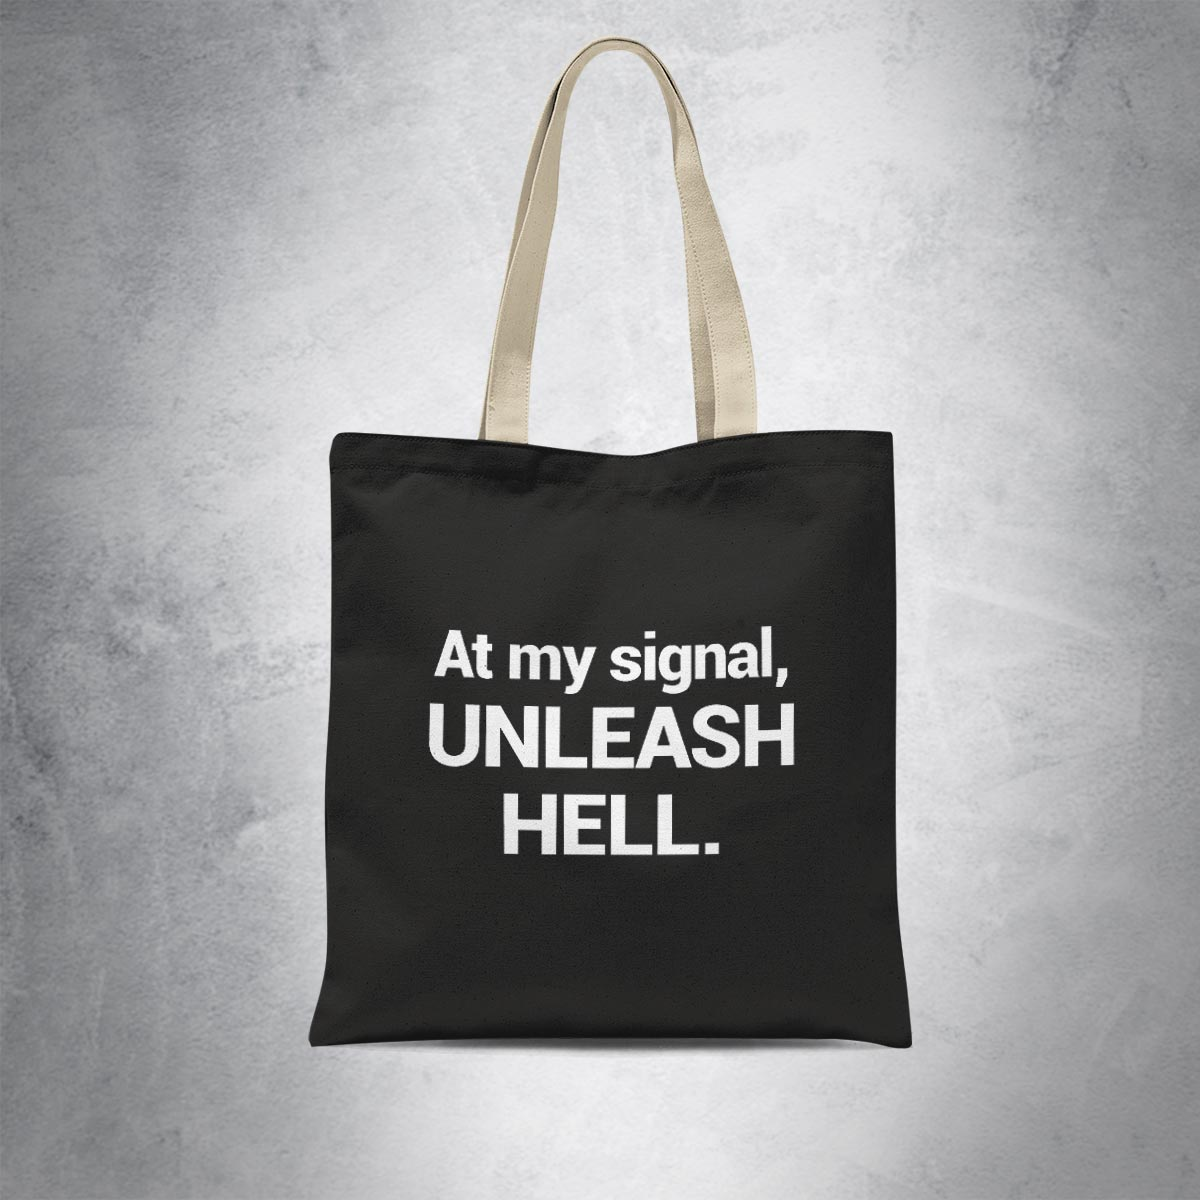 GLADIATOR - At my signal